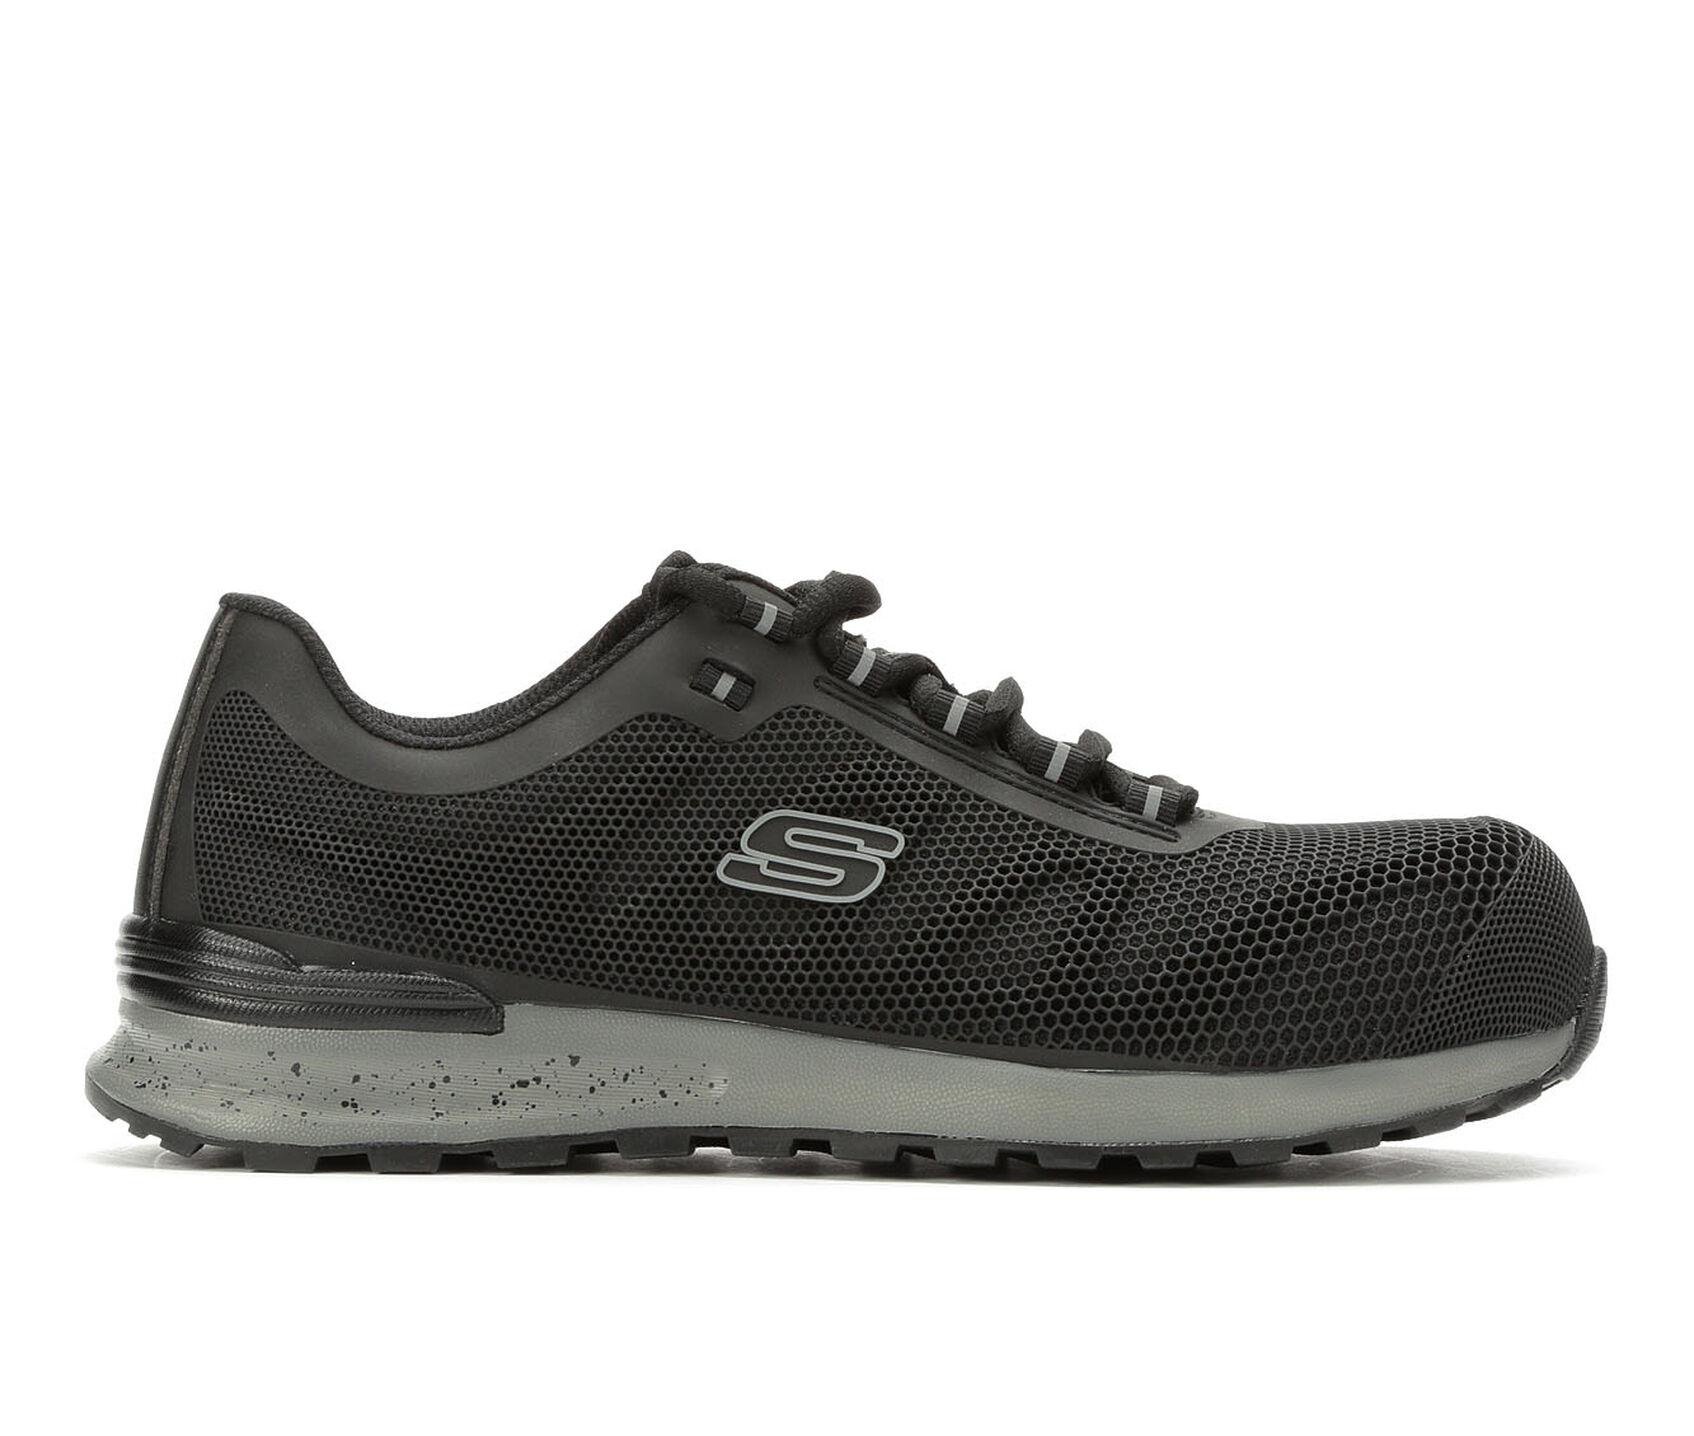 3ab4eb31b3e ... Skechers Work Bulklin 77180 Work Shoes. Previous